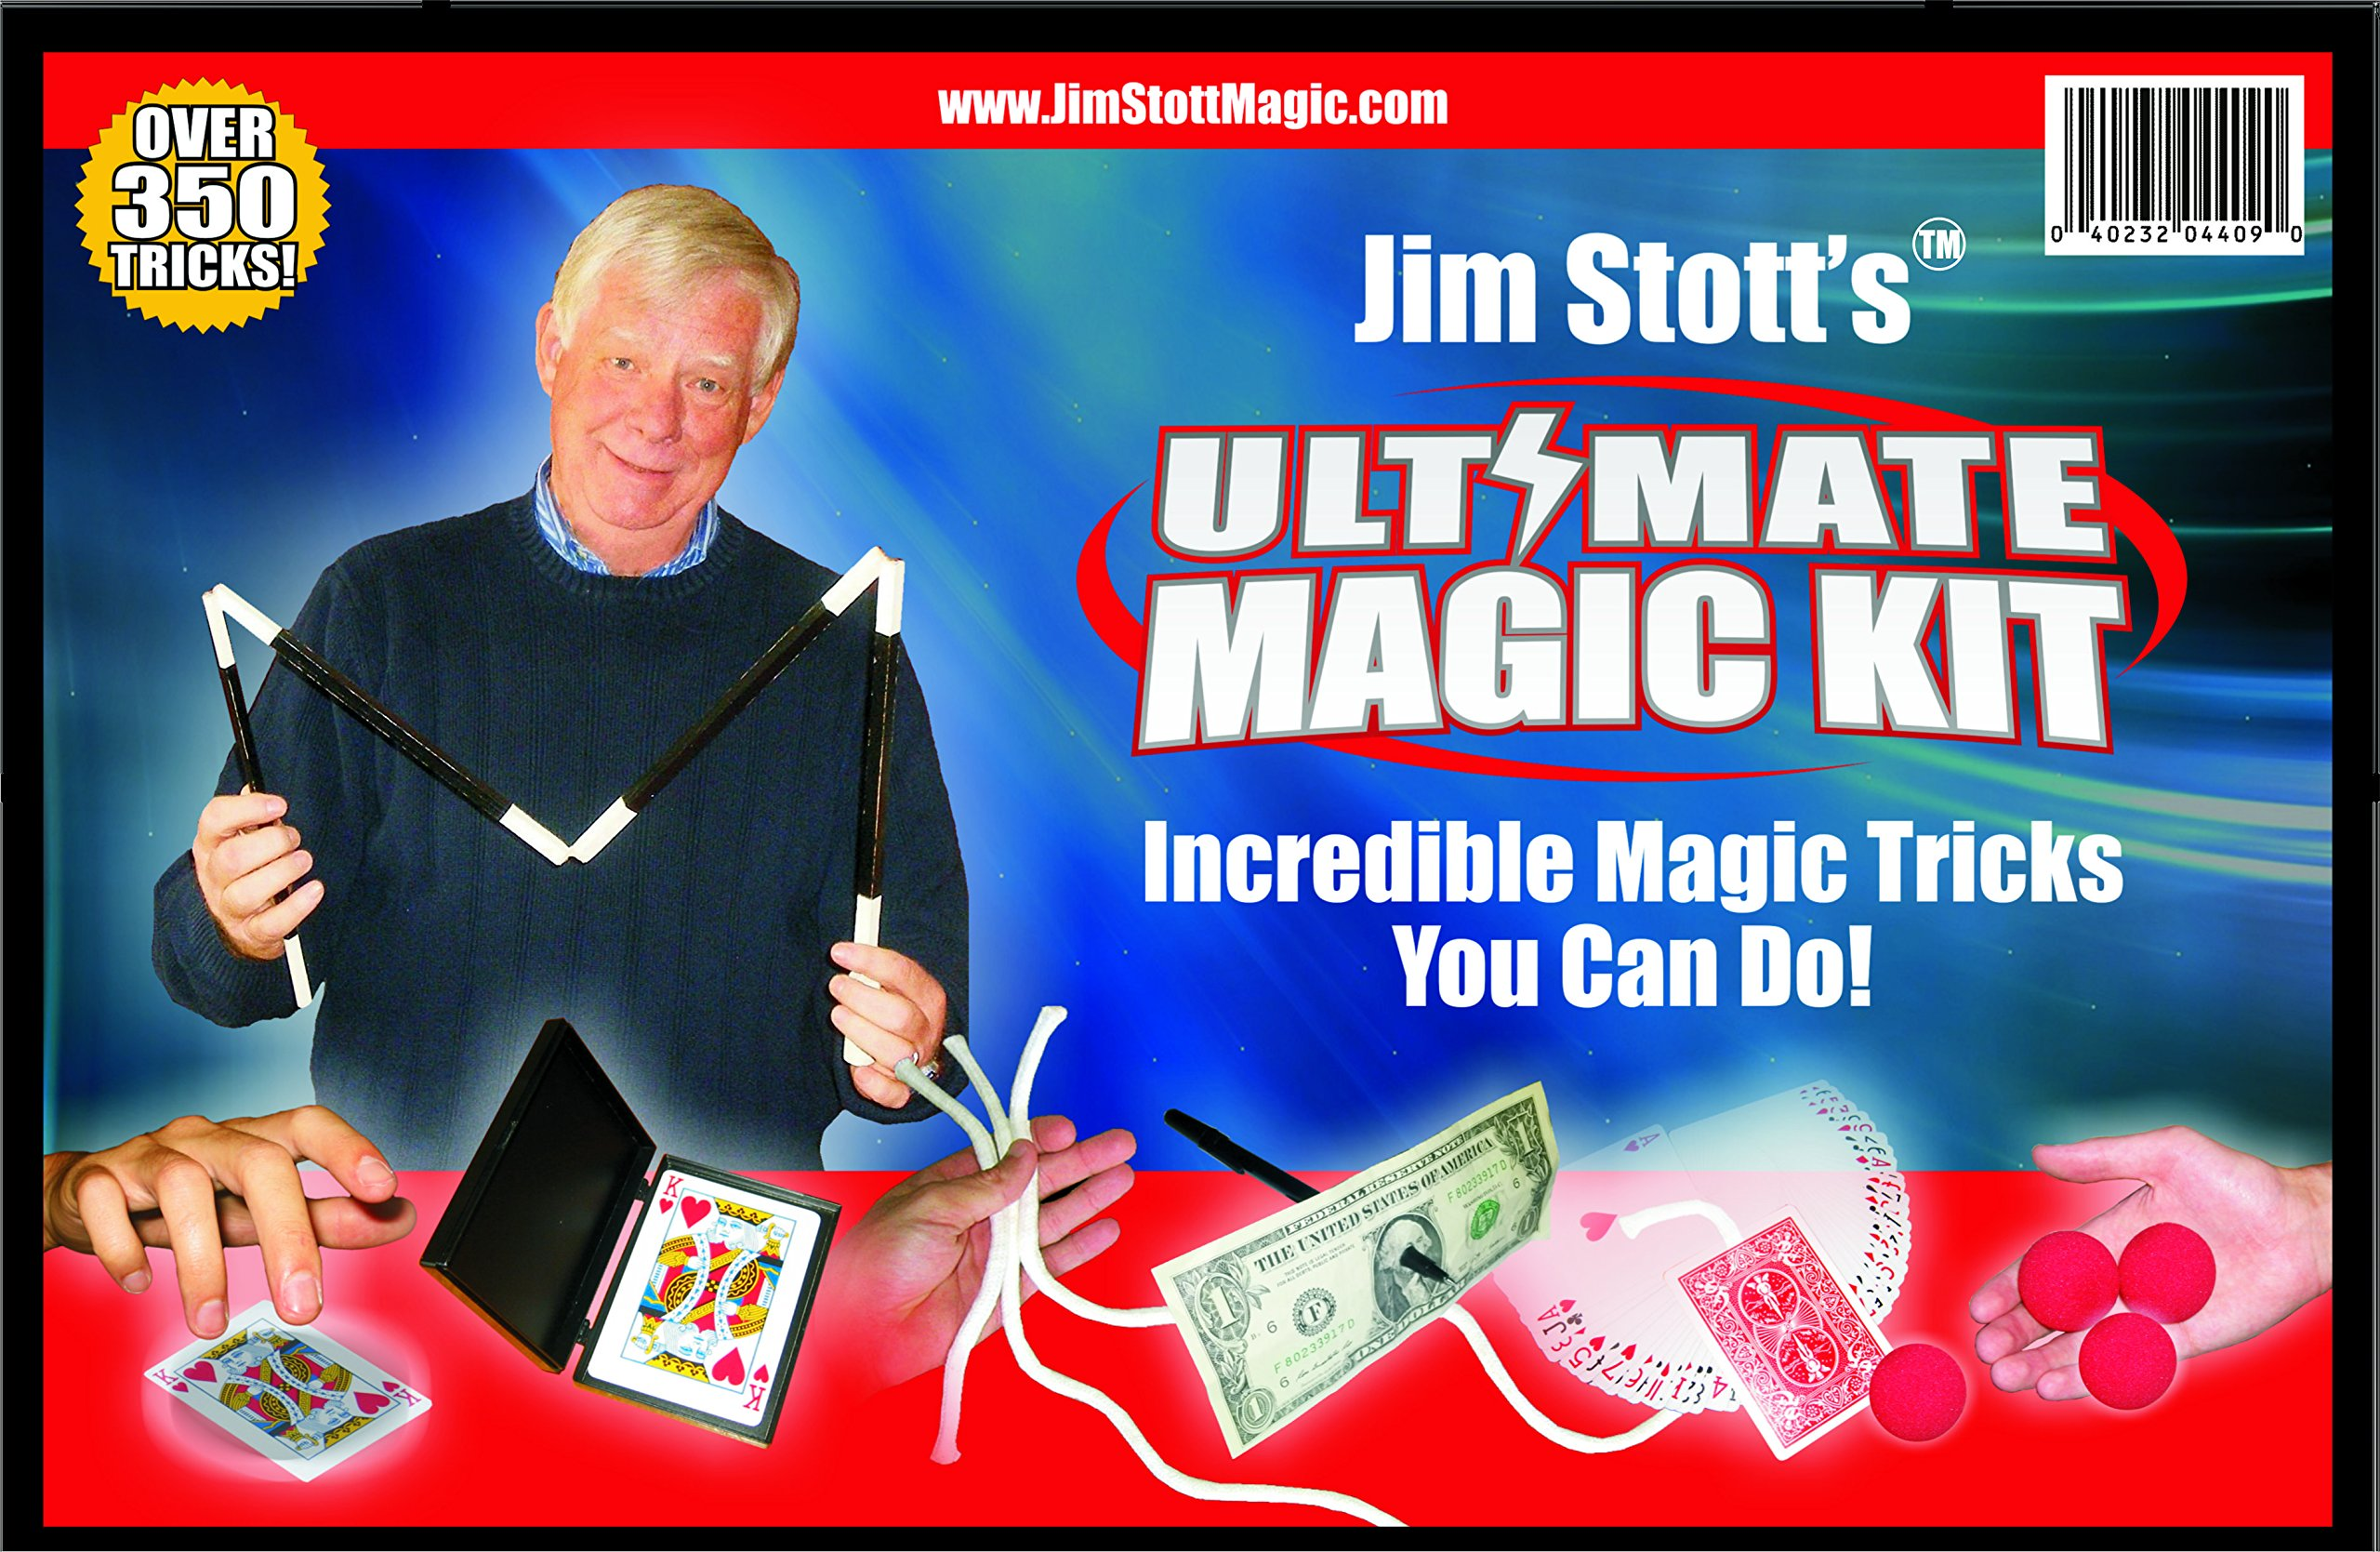 Jim Stott's 'Ultimate Magic Kit, Magic Tricks Set for Adults, Magic Cards Box, Svengali Card Deck, The 3 Rope Mystery, The Incredible Levitation System, Magic Sponge Balls, Magic Pen Penetration by Jim Stott Magic